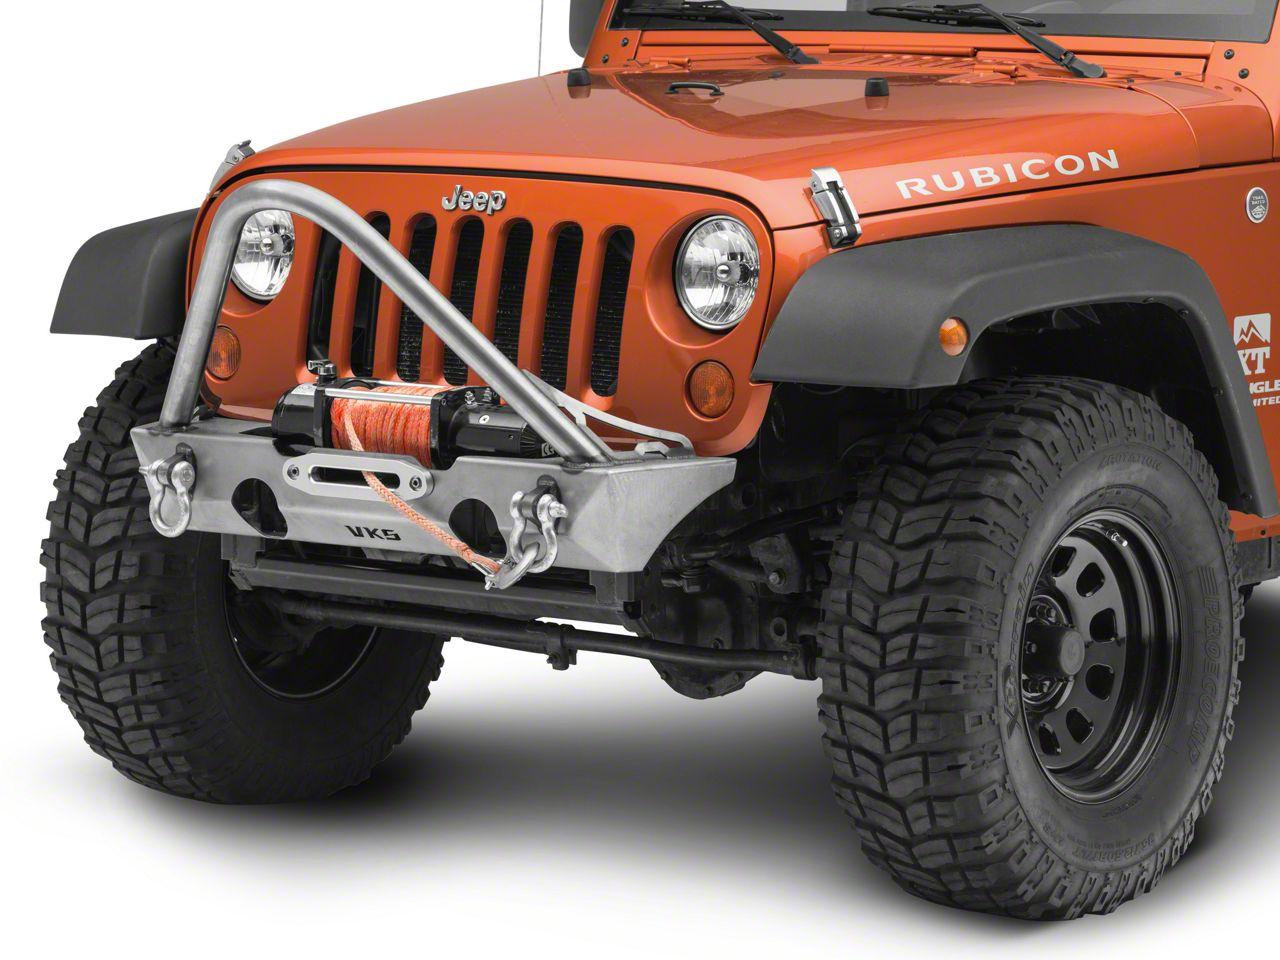 VKS Fabrication Enforcer Front Winch Bumper w/ Stinger (07-18 Jeep Wrangler JK)